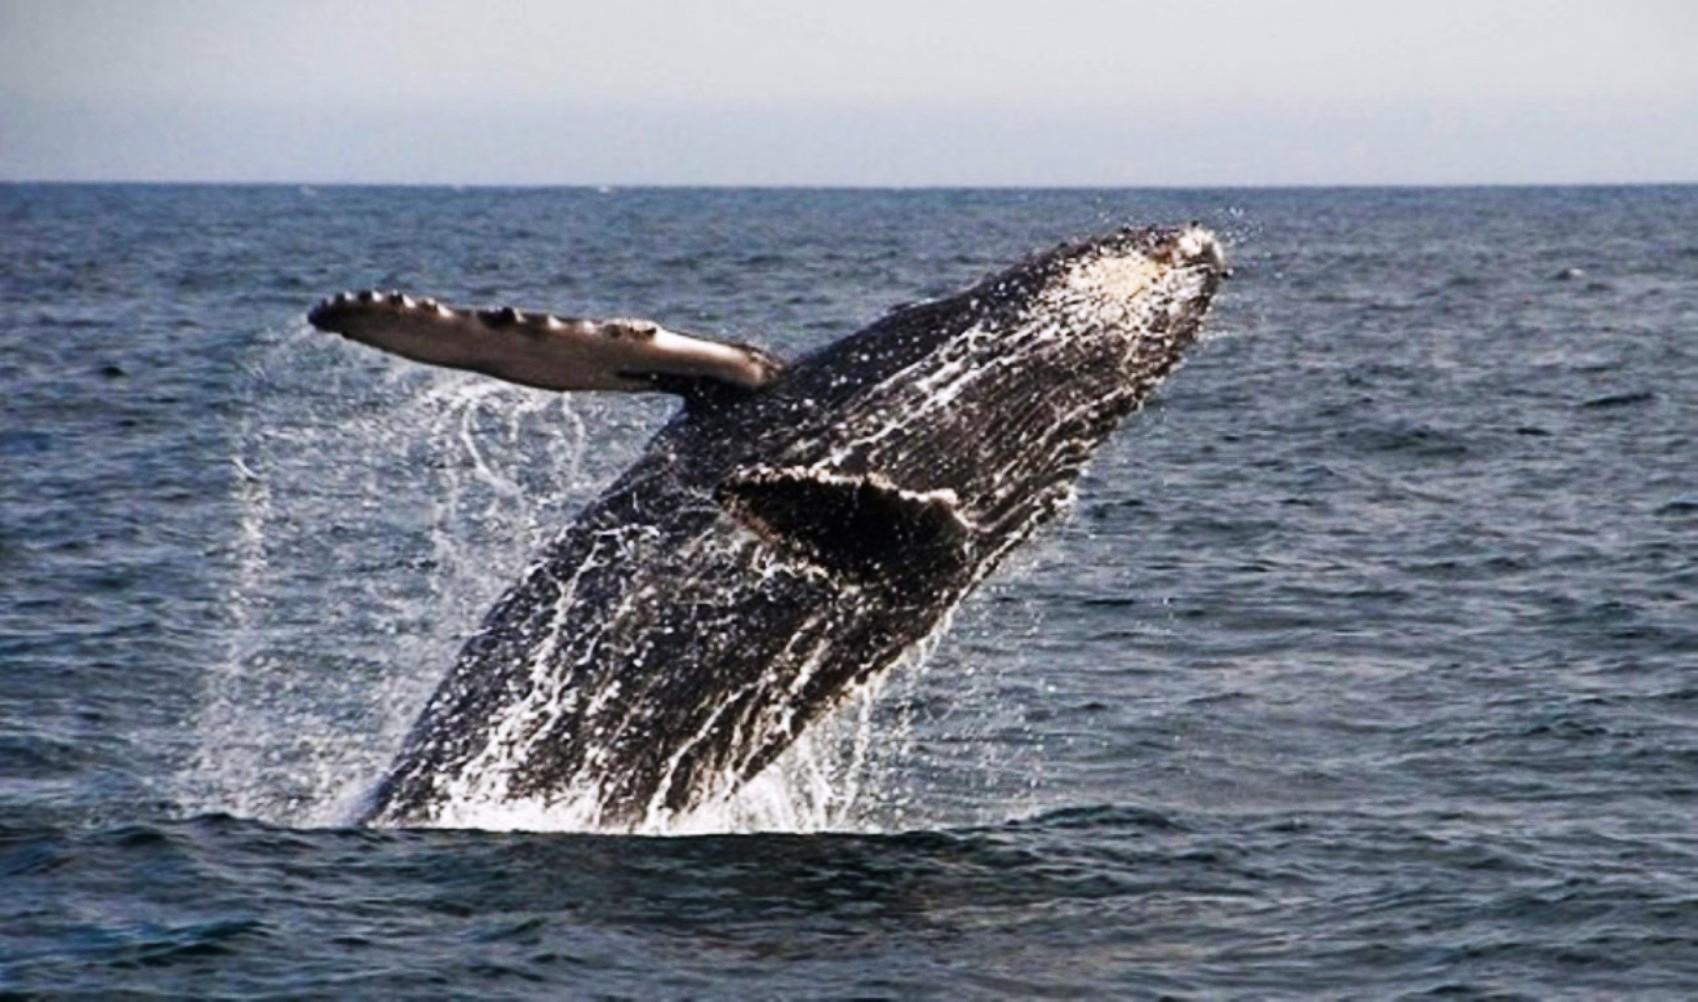 https://abload.de/img/whalewatchingatbahiam0vqgs.jpg